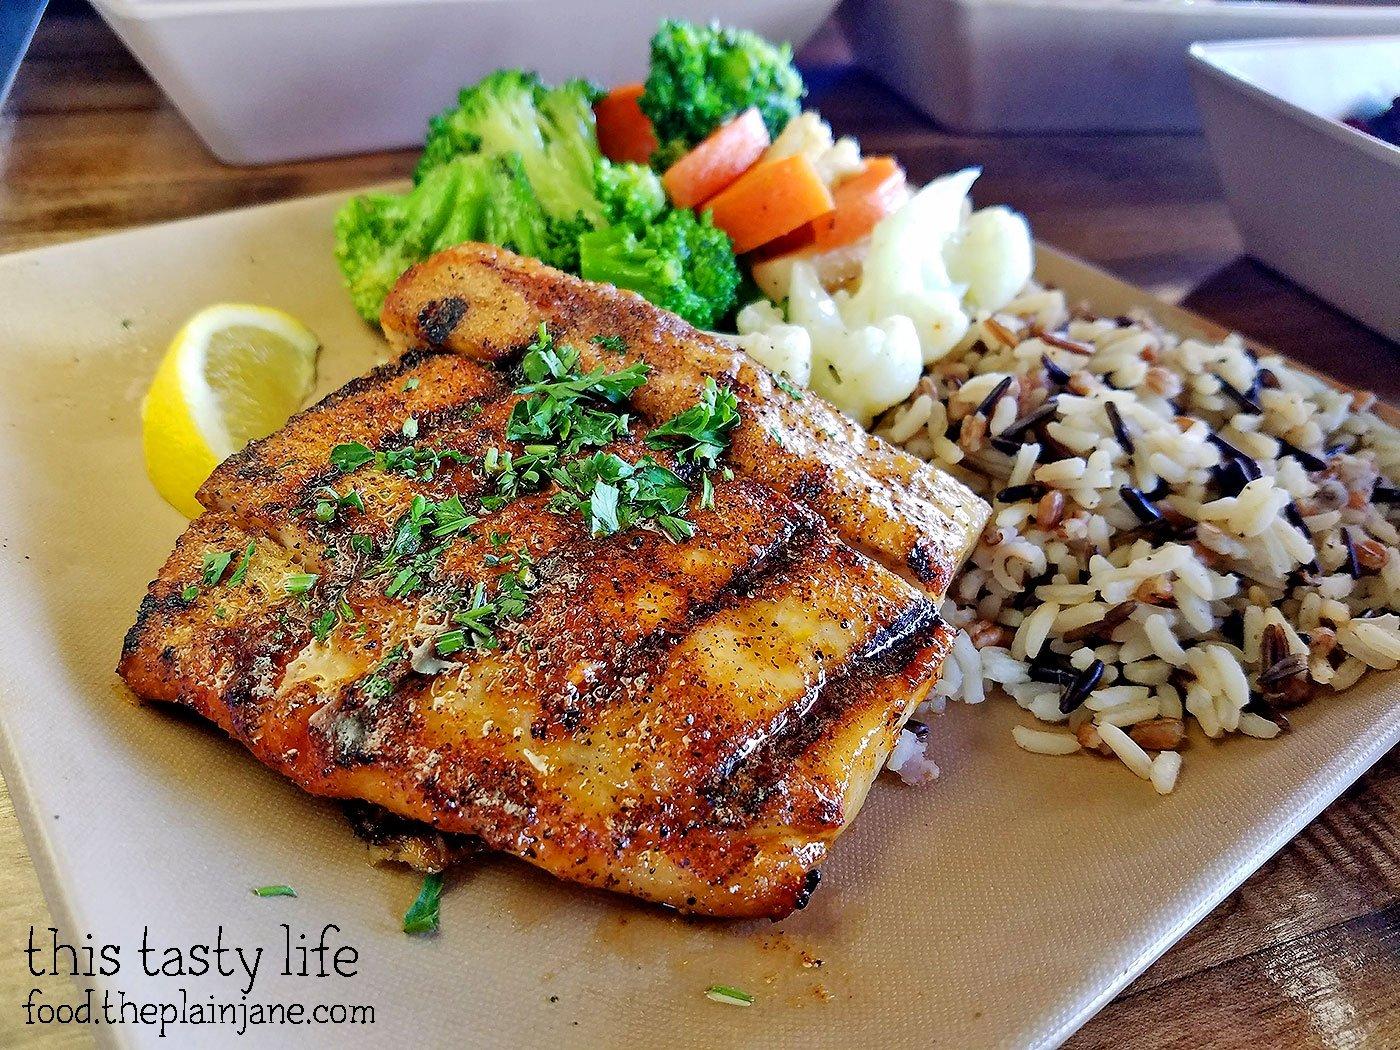 Point Loma Fish Shop - This Tasty Life